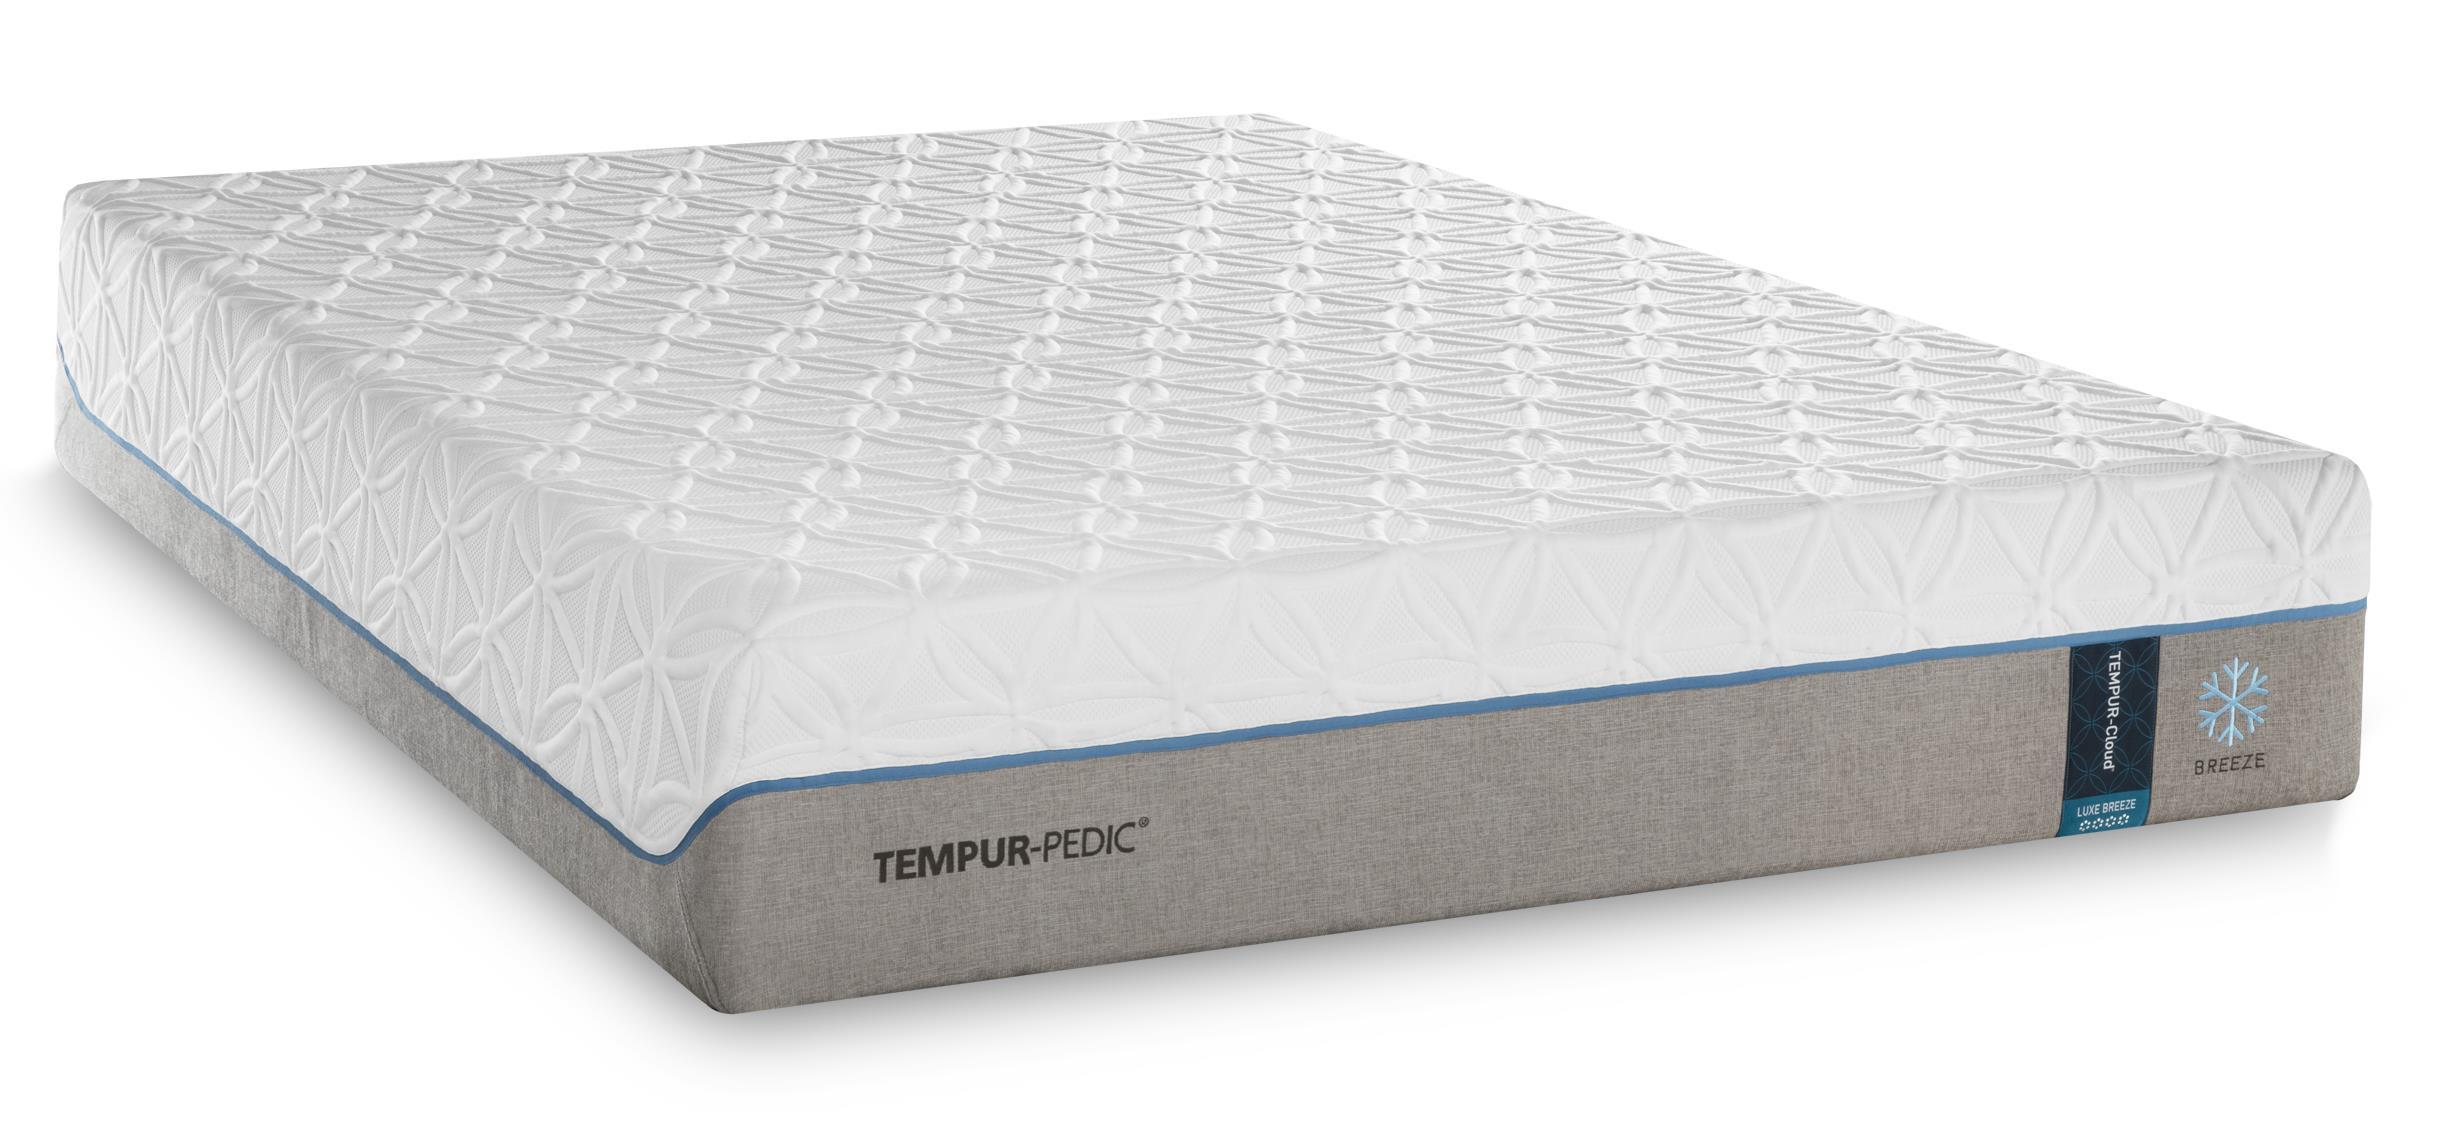 Tempur Pedic TEMPUR Cloud Luxe Breeze 2 Twin Extra Long